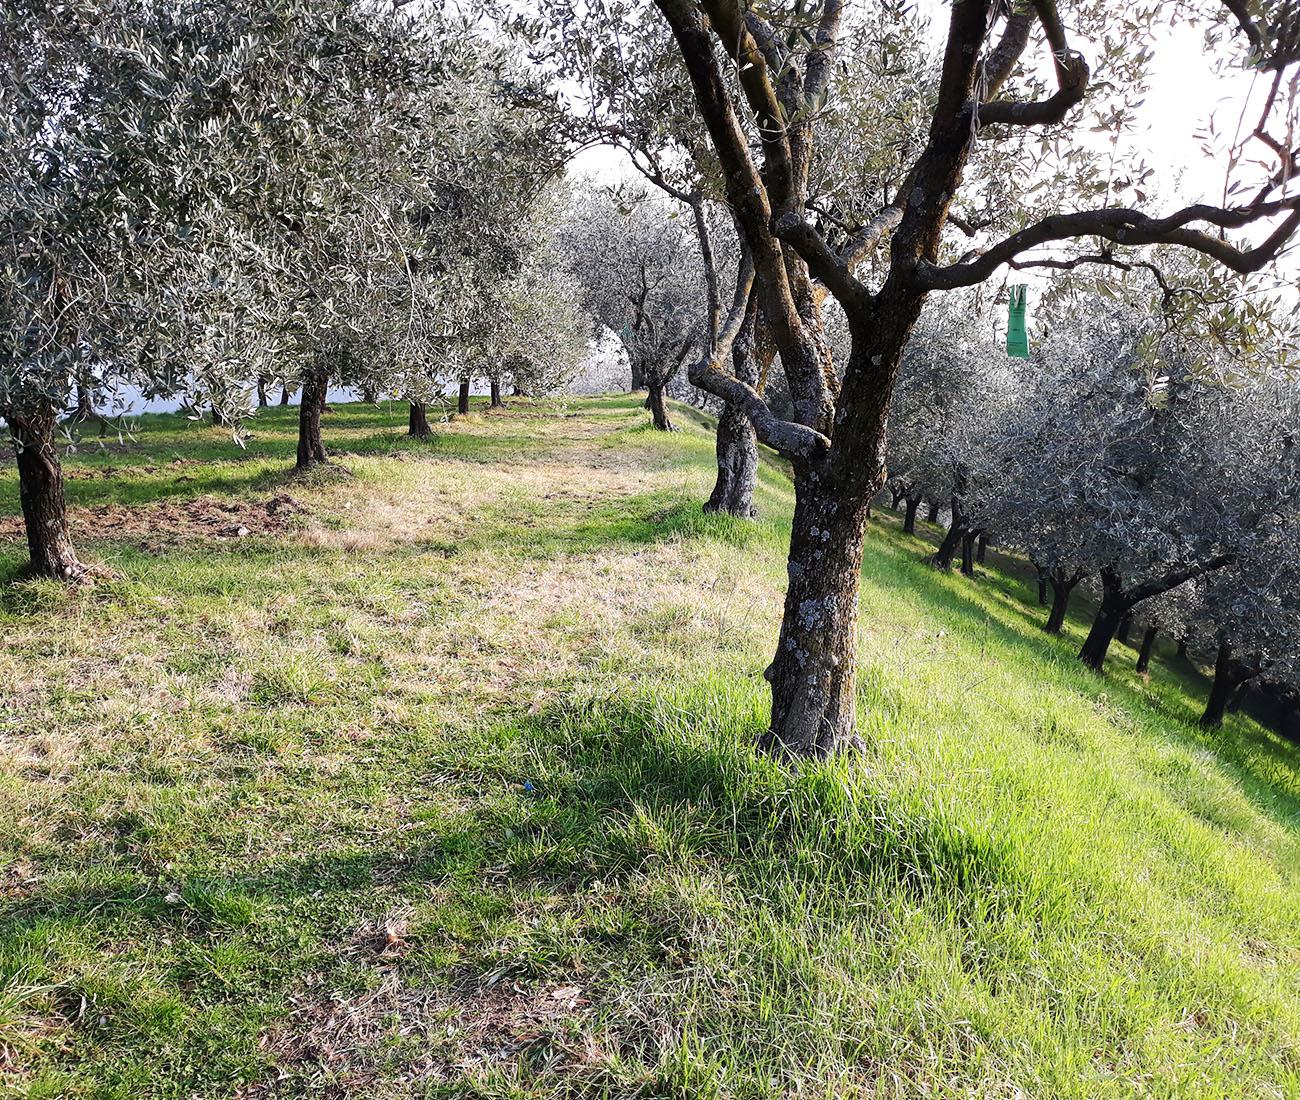 Diesel Farm – Nuova cantina vinicola e agriturismo a Marostica